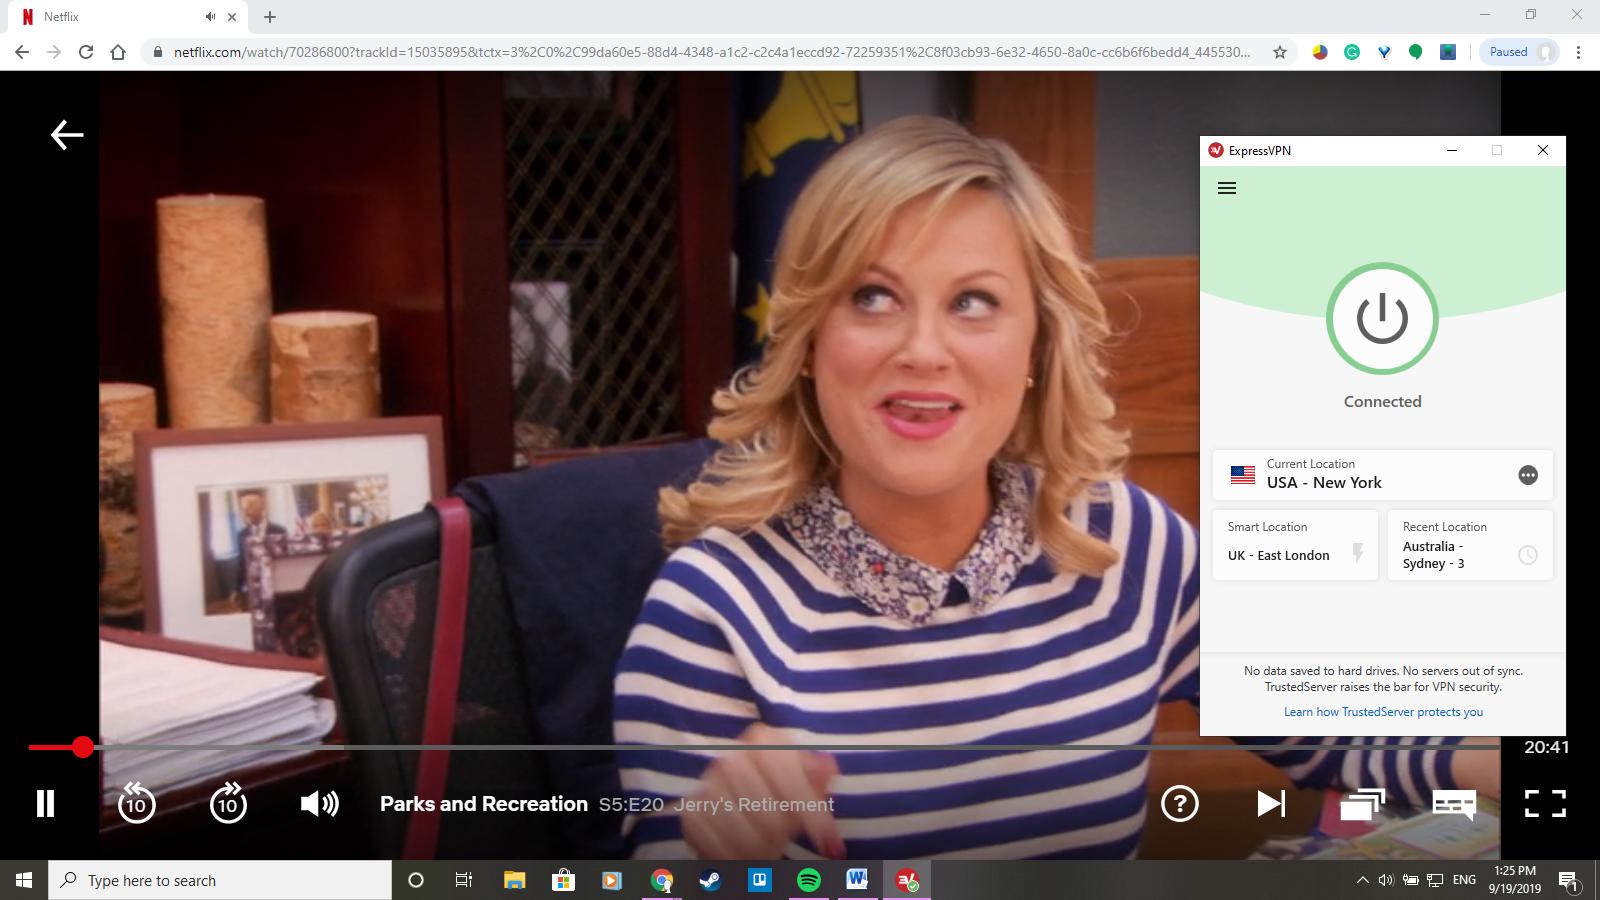 "oglądanie ""Parks and Recreation"" za pomocą ExpressVPN"